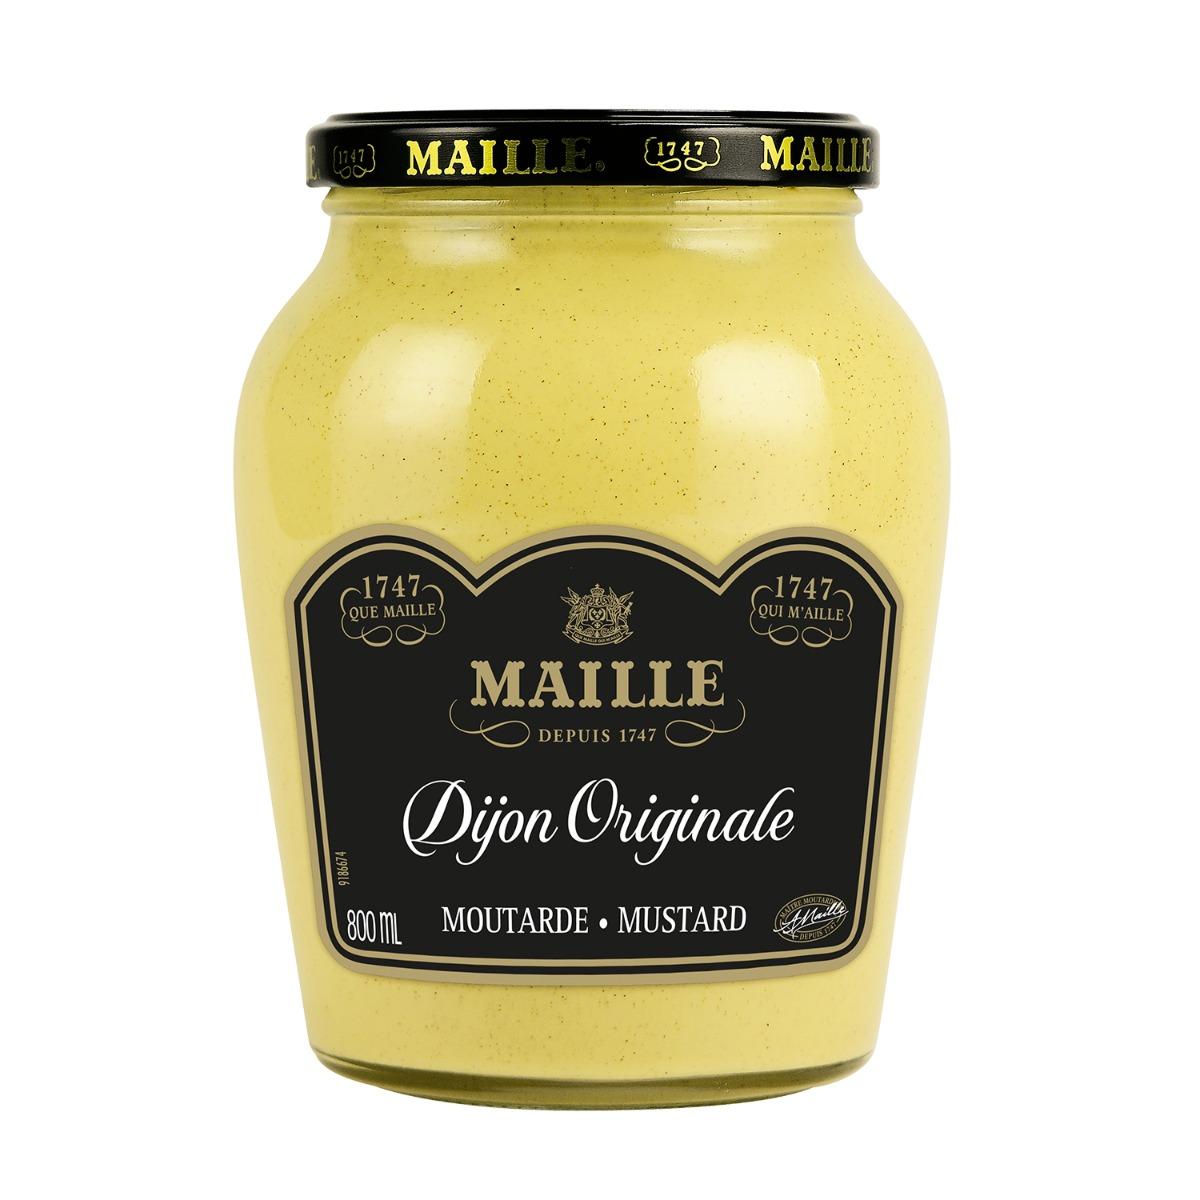 Mustar Dijon Original Maille, 865 g imagine